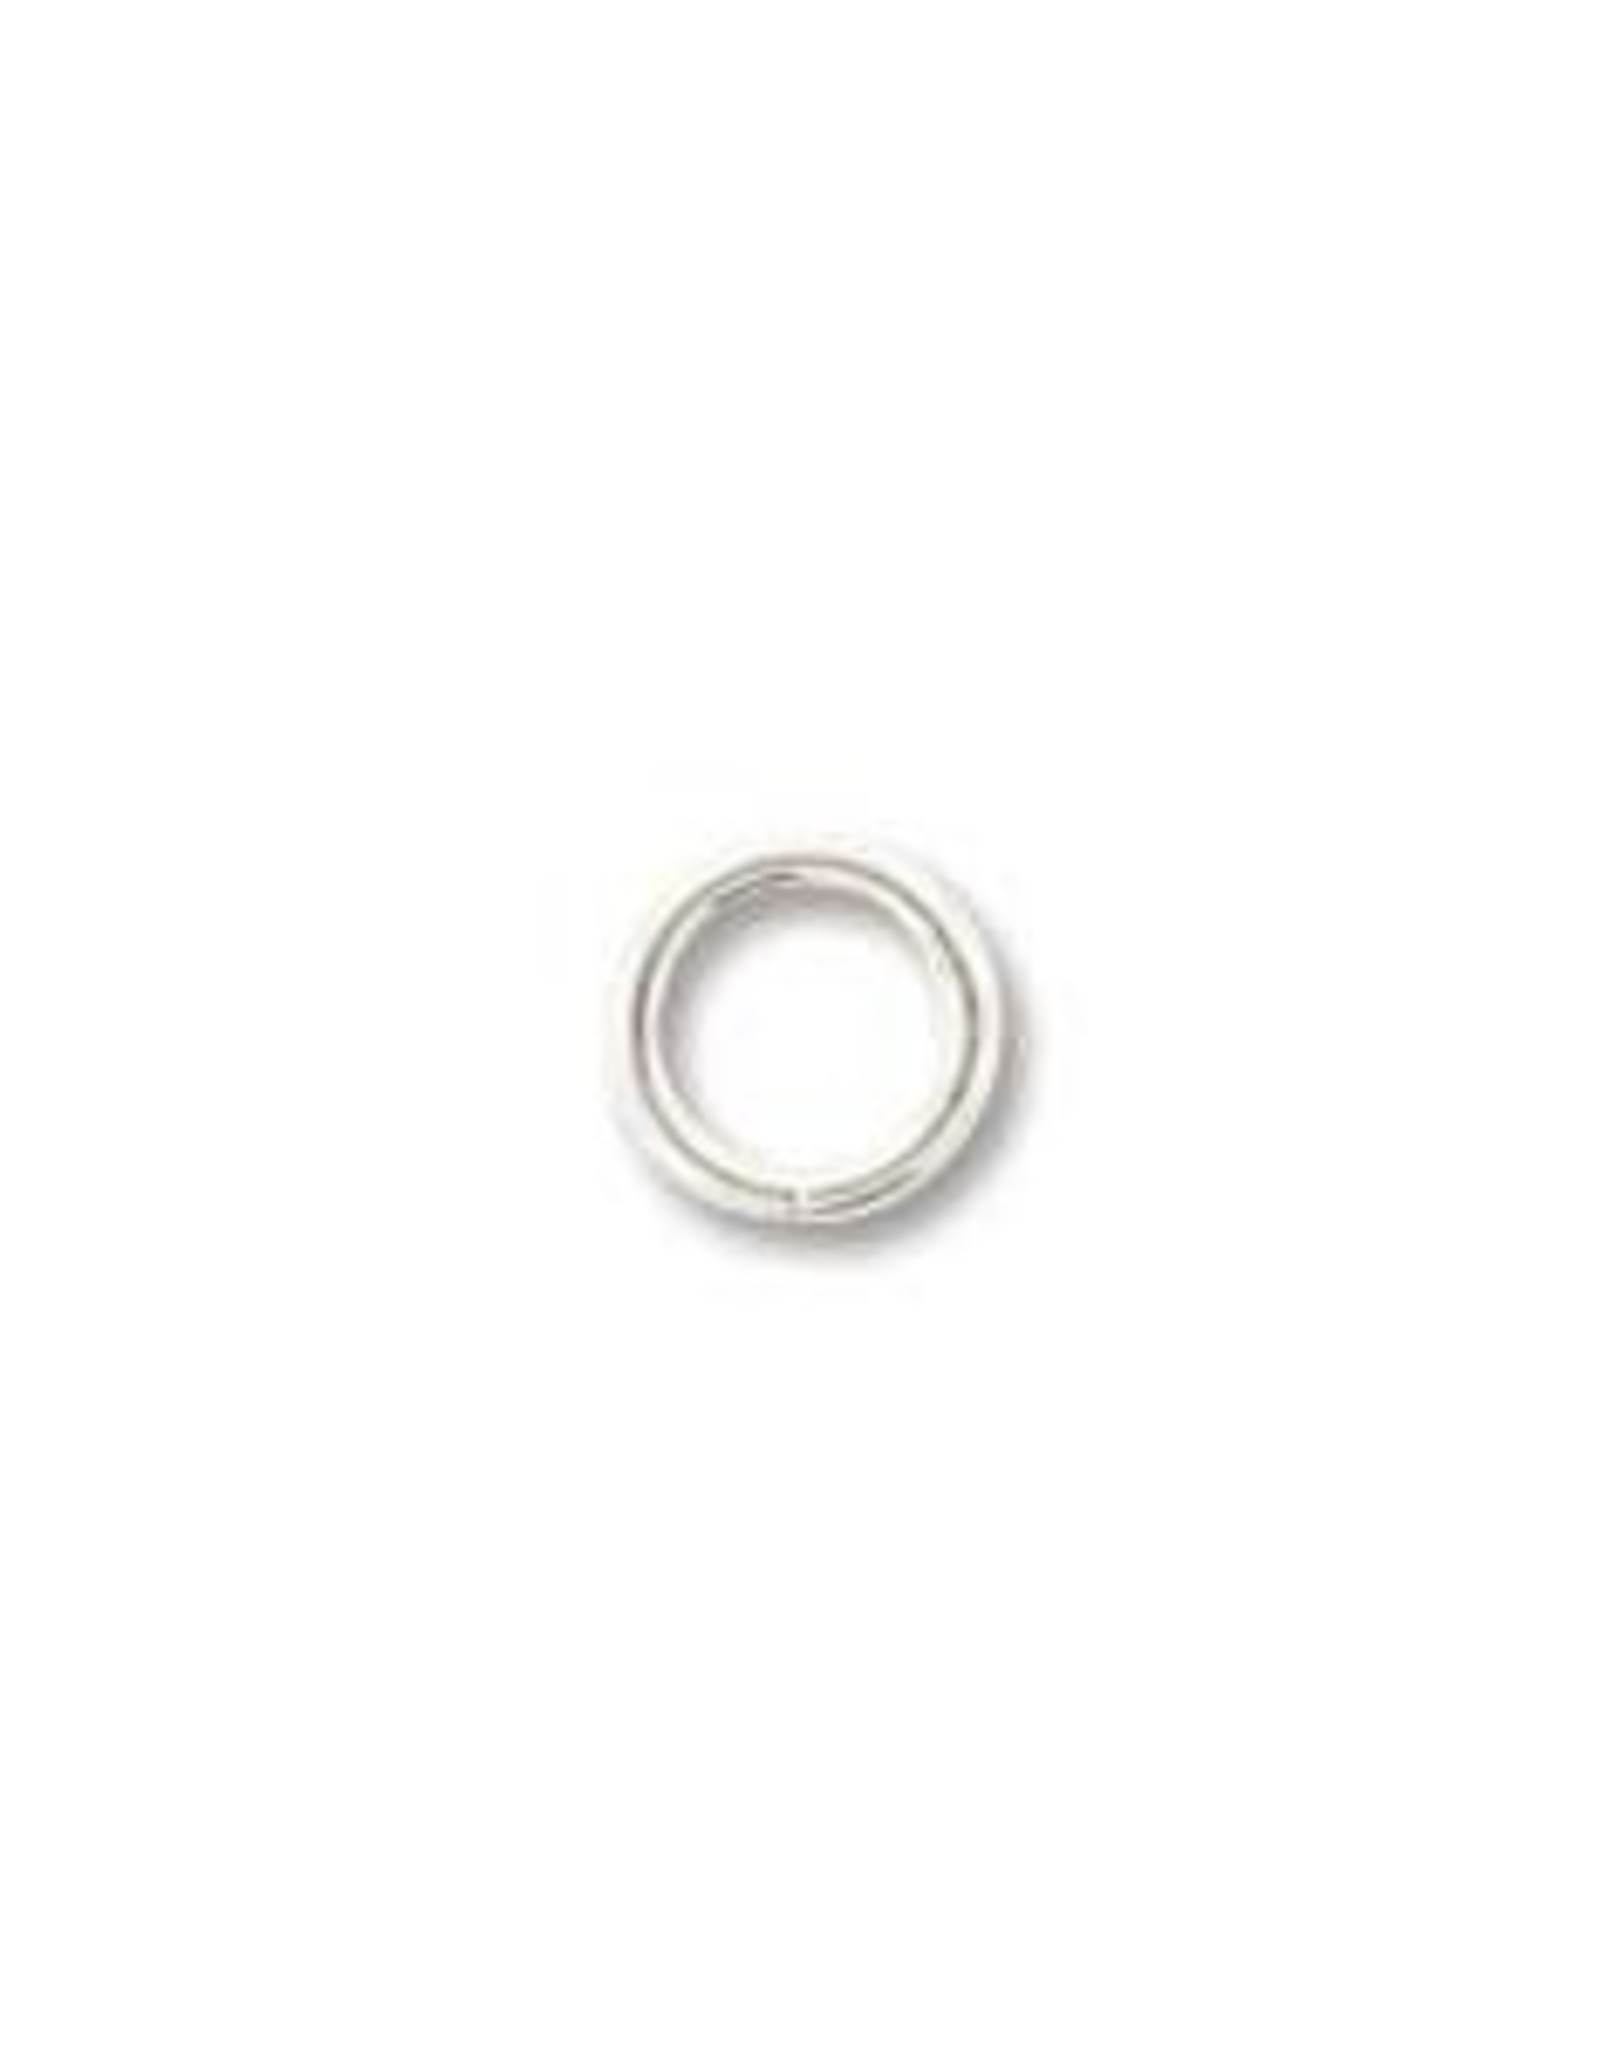 5mm Jump Ring 19ga Silver Plate Qty 144